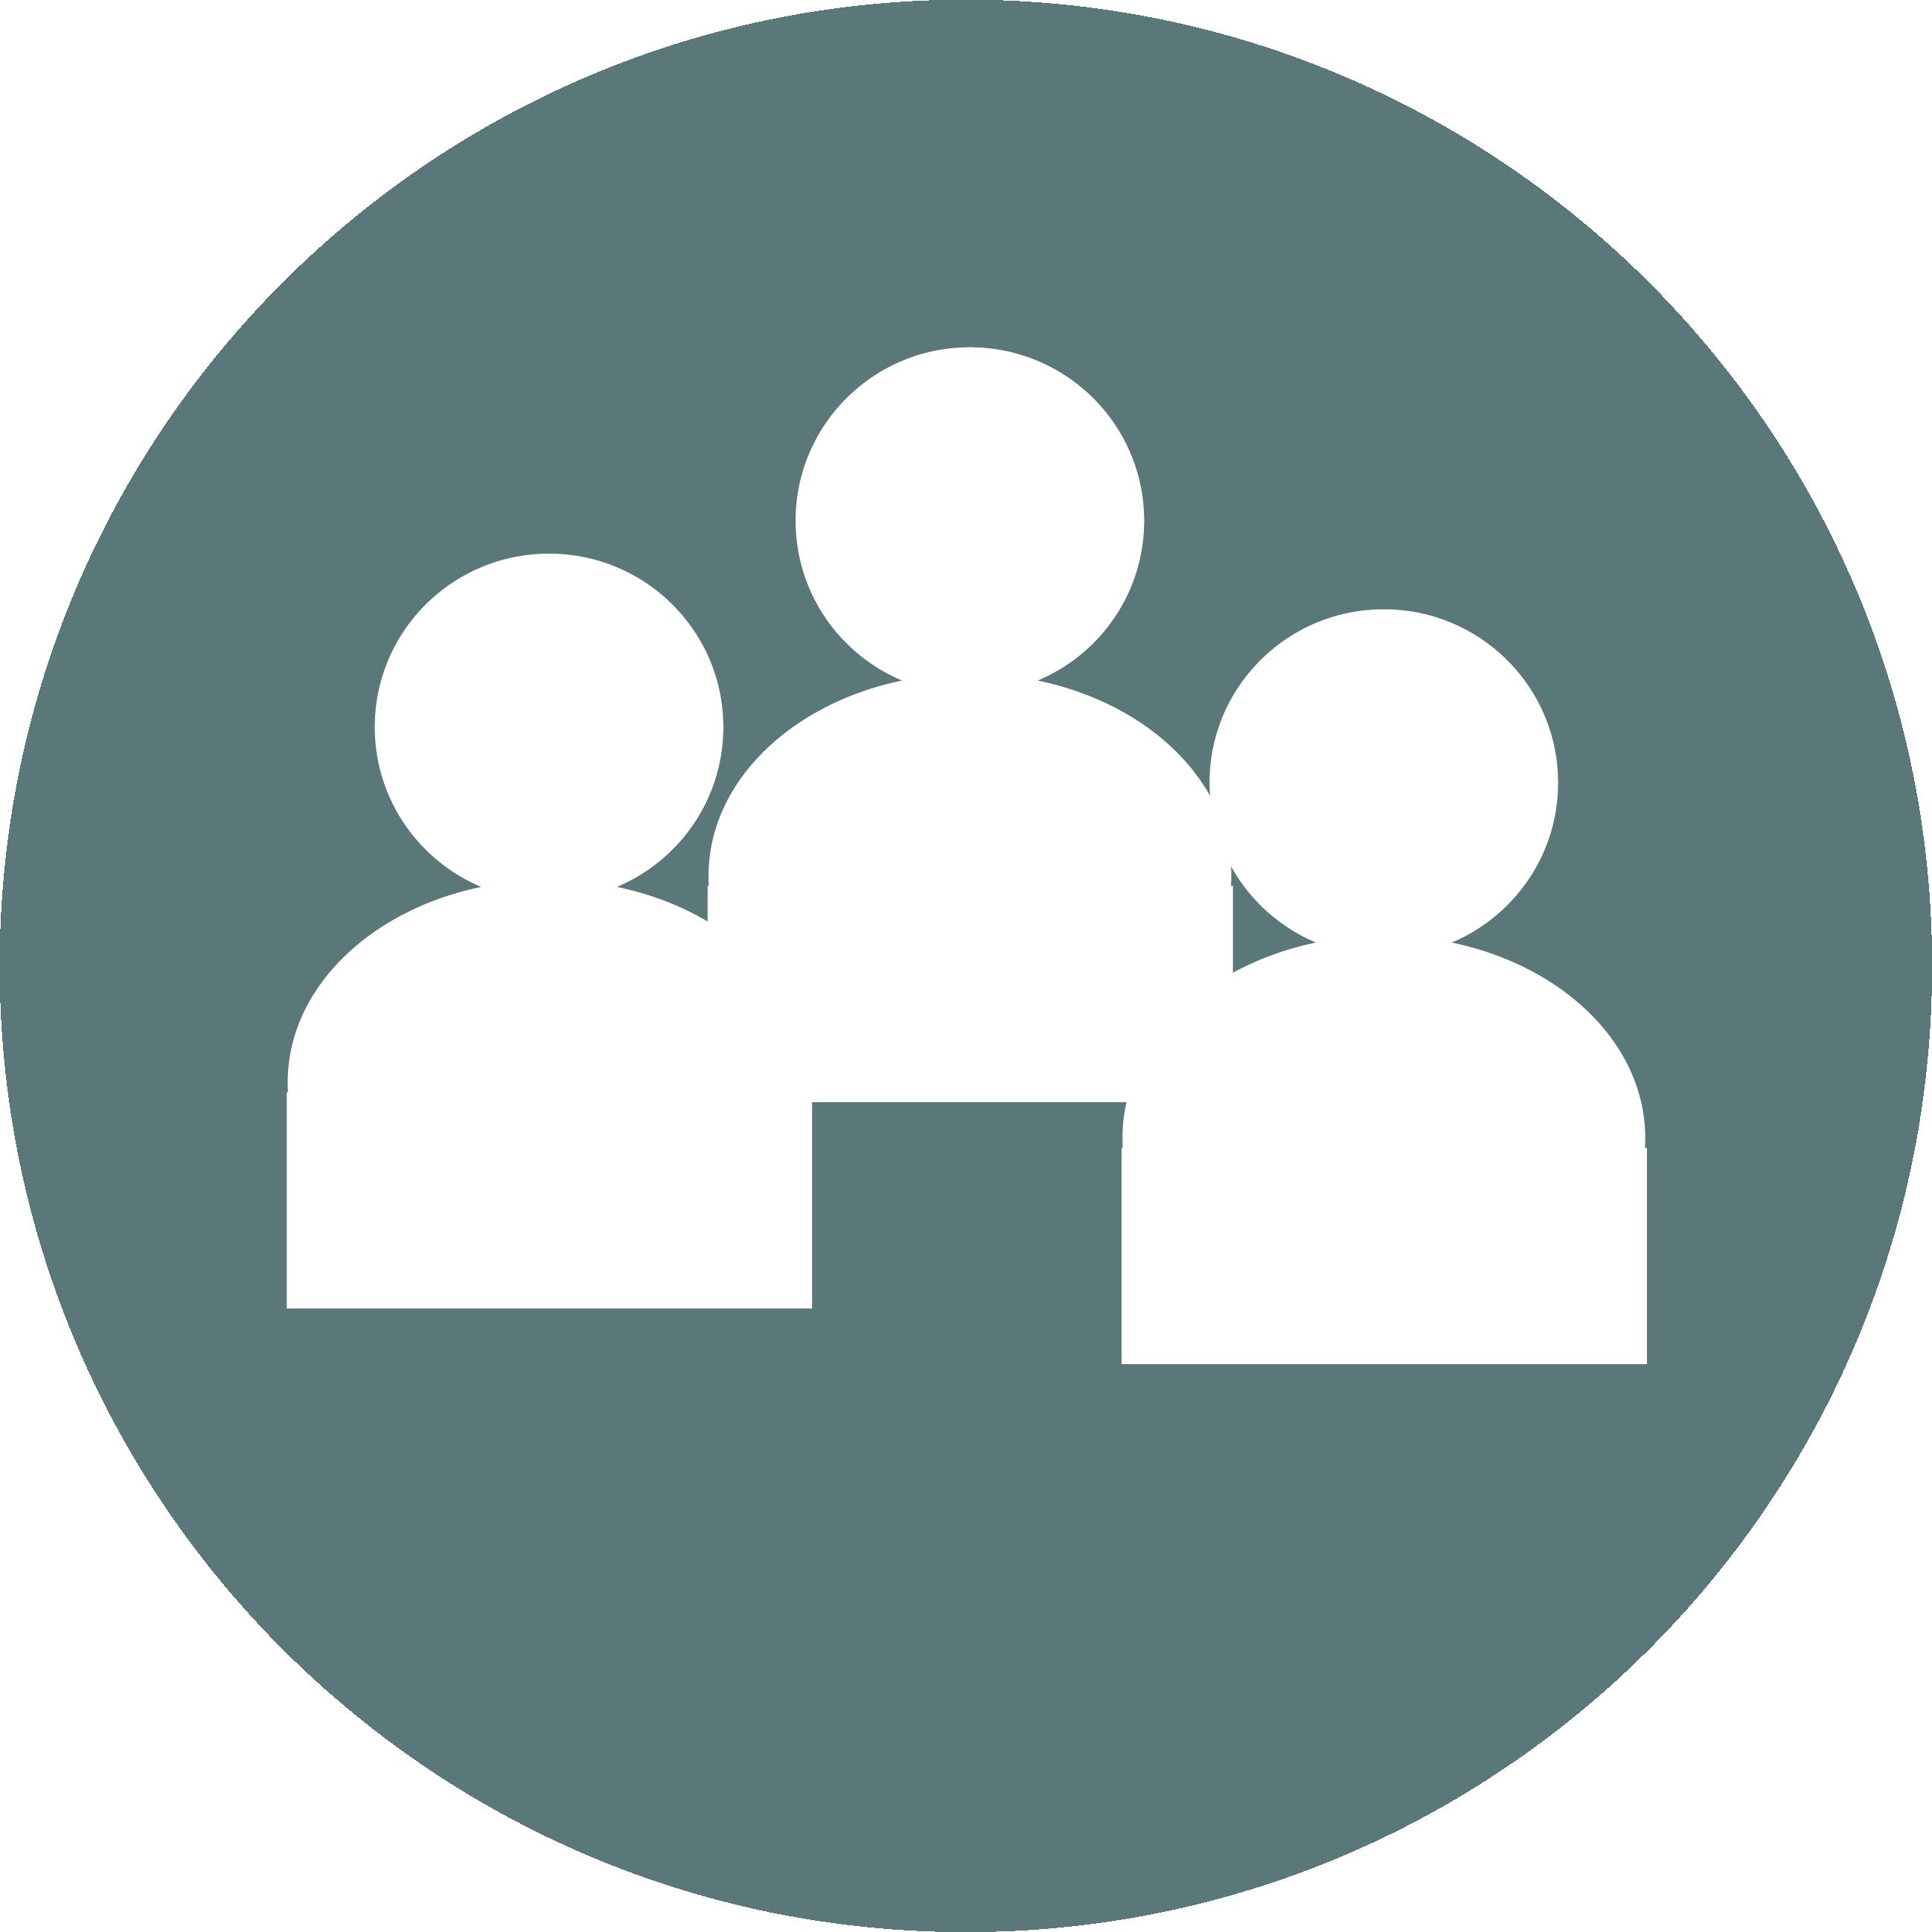 Groups Symbol